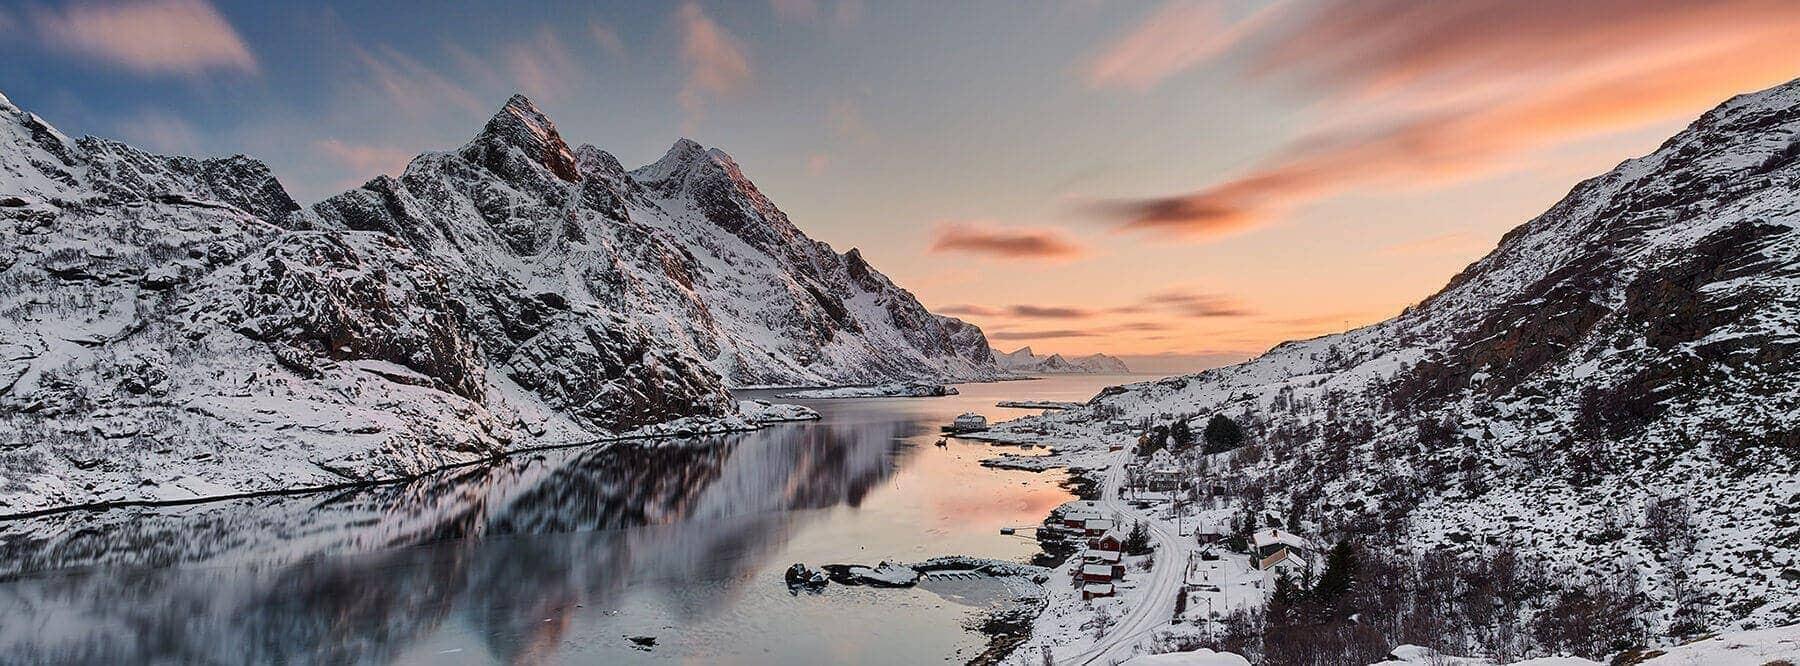 Landscape Seascape Photography Workshop Lofoten Islands Norway 2021 Francesco Gola Masterclass